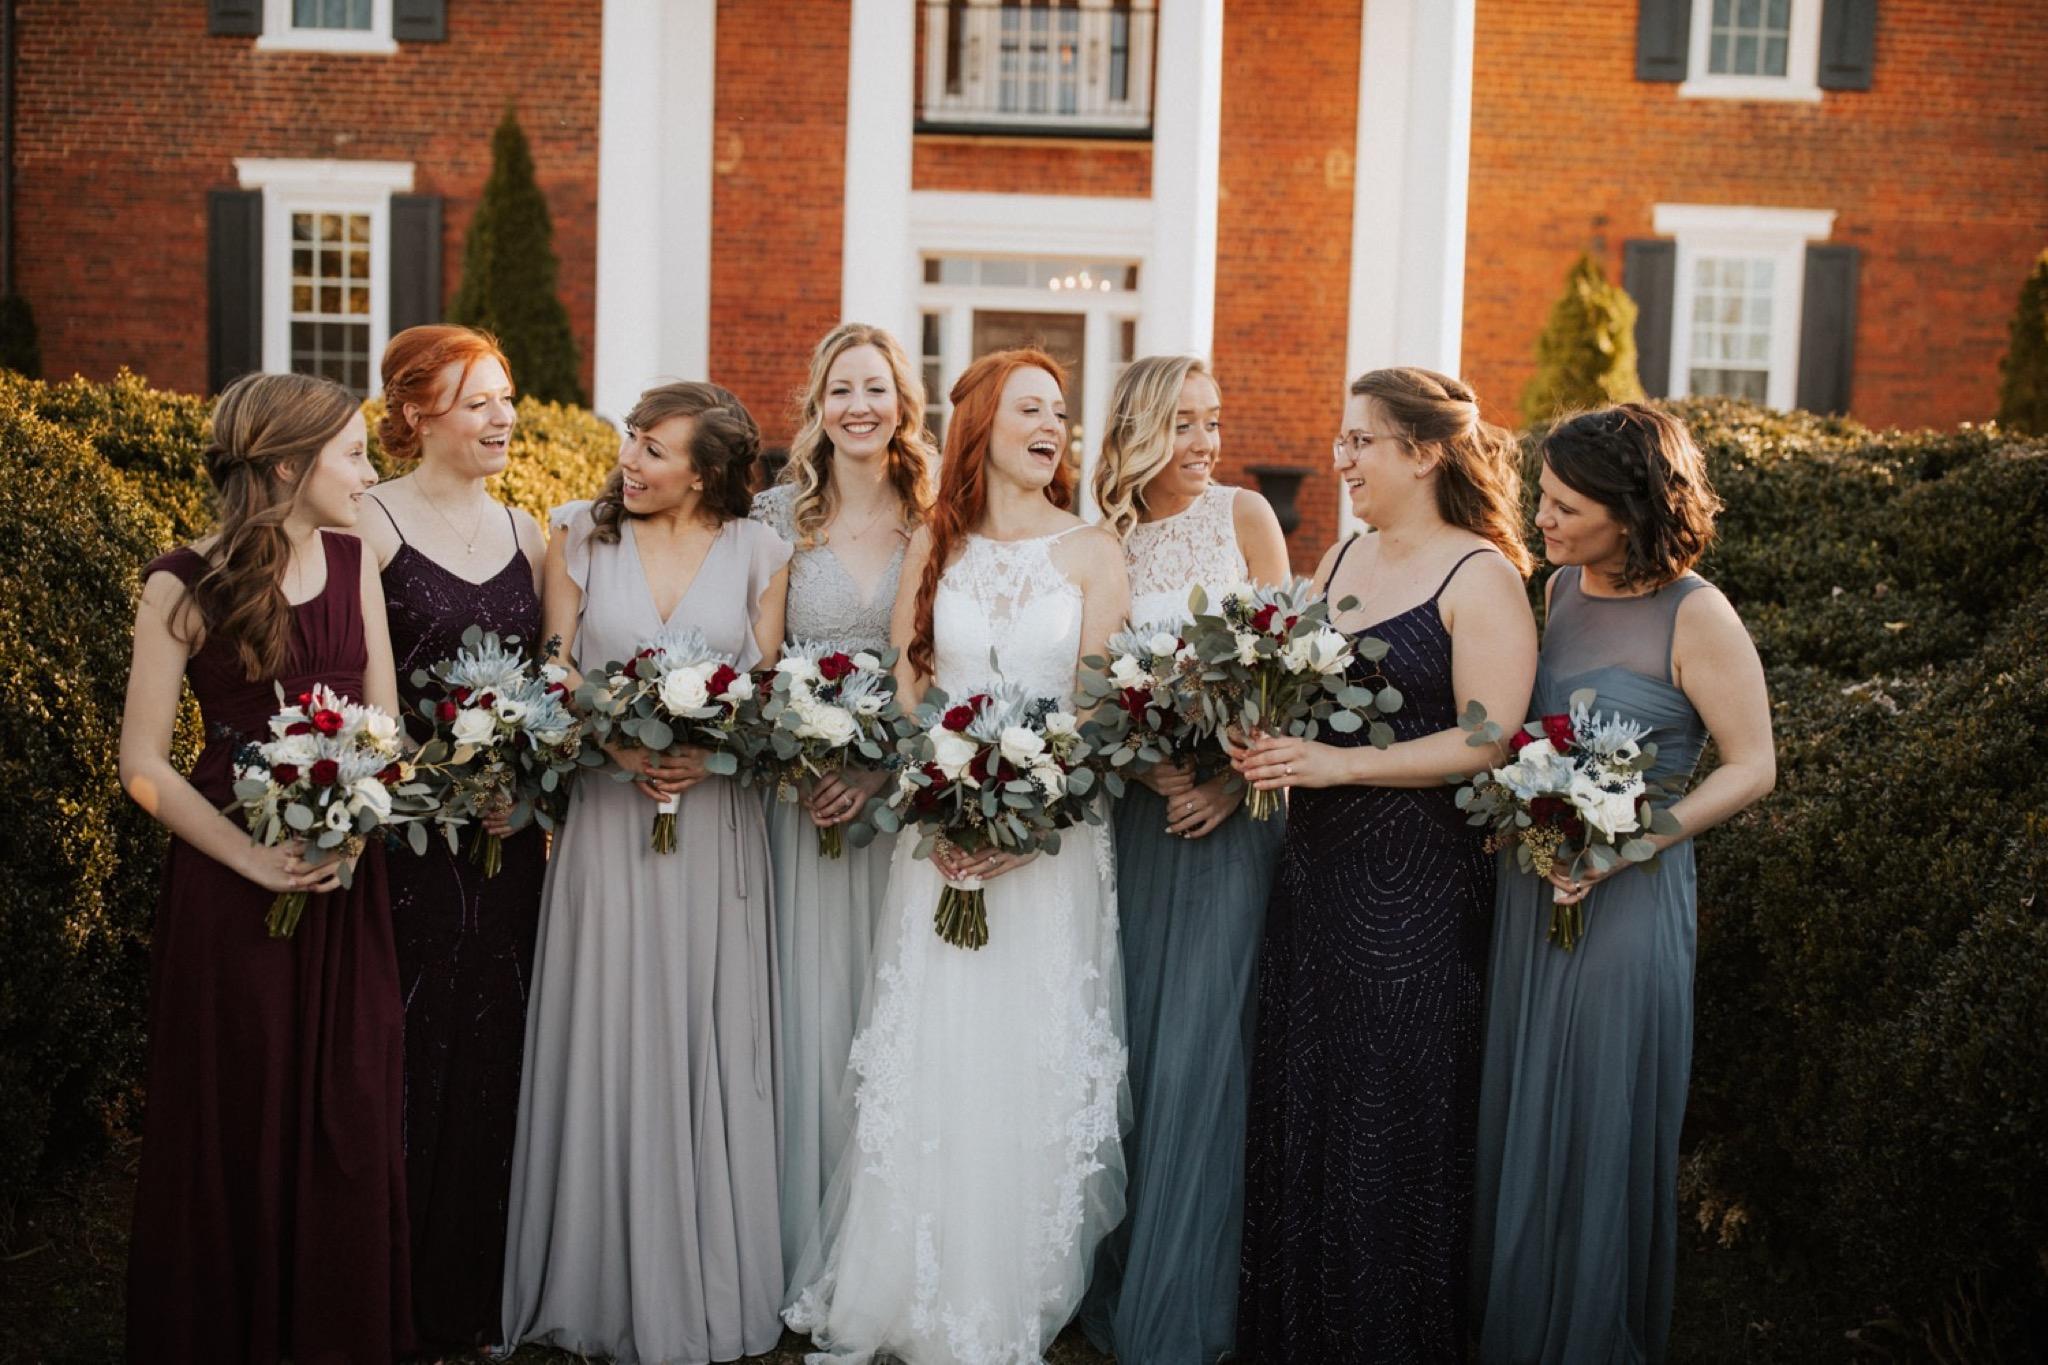 58_West Manor Estate Weddings - Pat Cori Photography-124_VirginiaWeddingPhotographer_bridesmaids_WestManorEstate_Portraits_Wedding.jpg